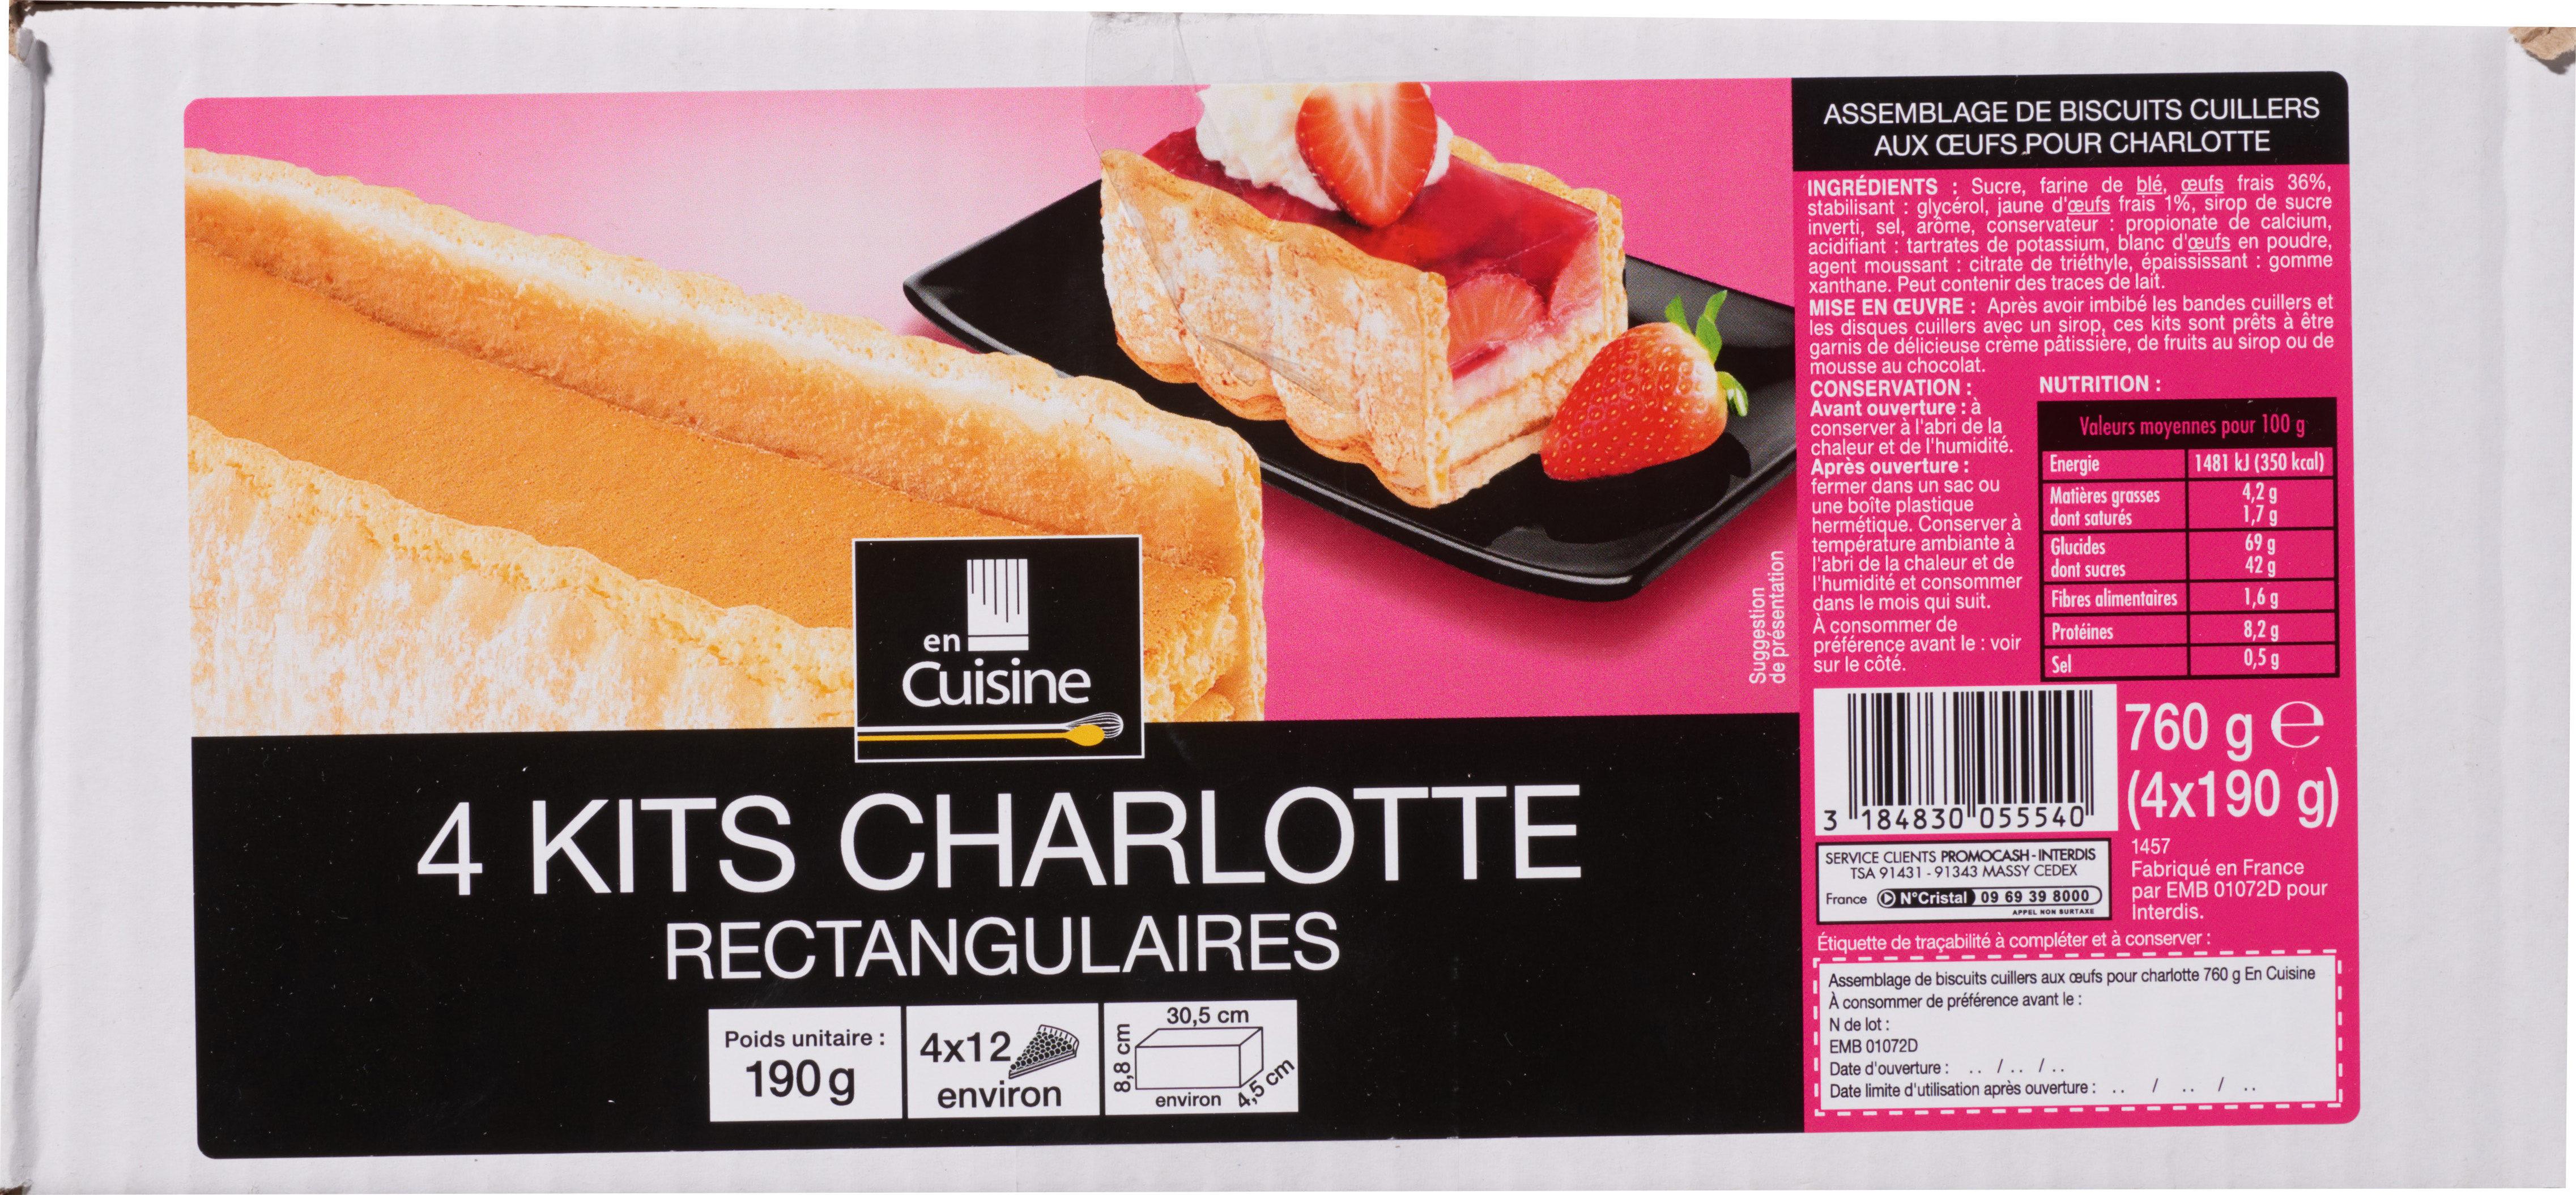 4 kits charlotte  rectangulaires - Produit